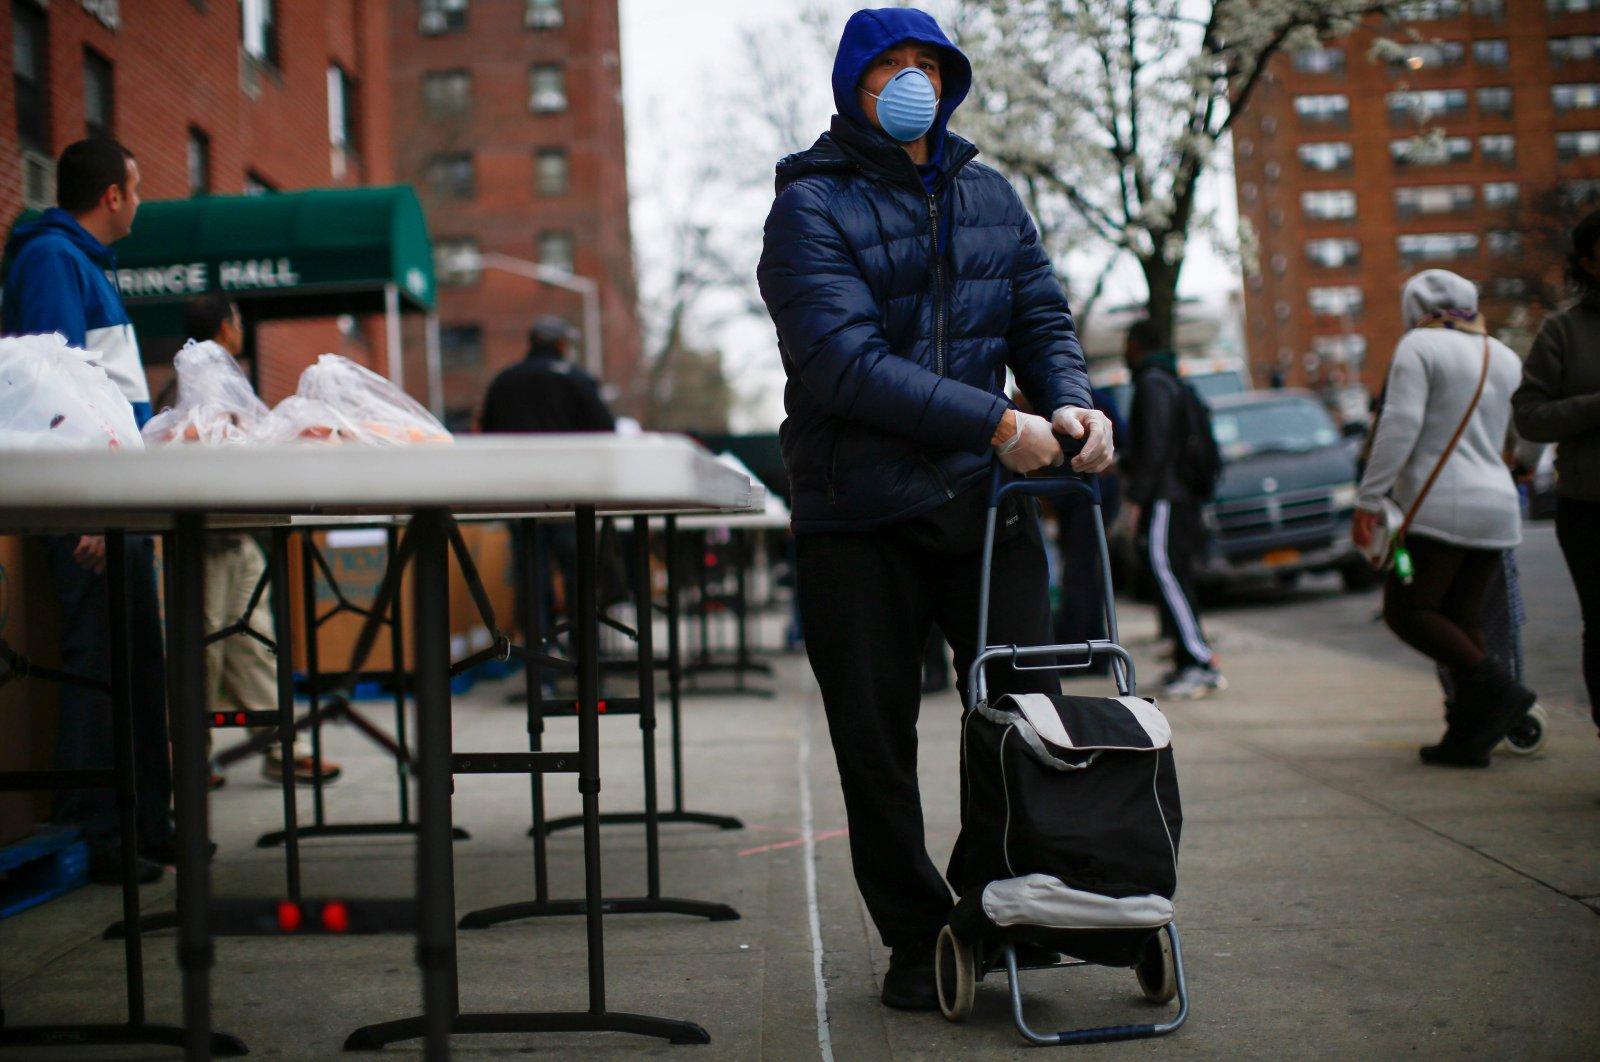 A man carries bags of groceries as volunteers distribute food in Harlem, New York City, Saturday, March 28, 2020. (AFP Photo)